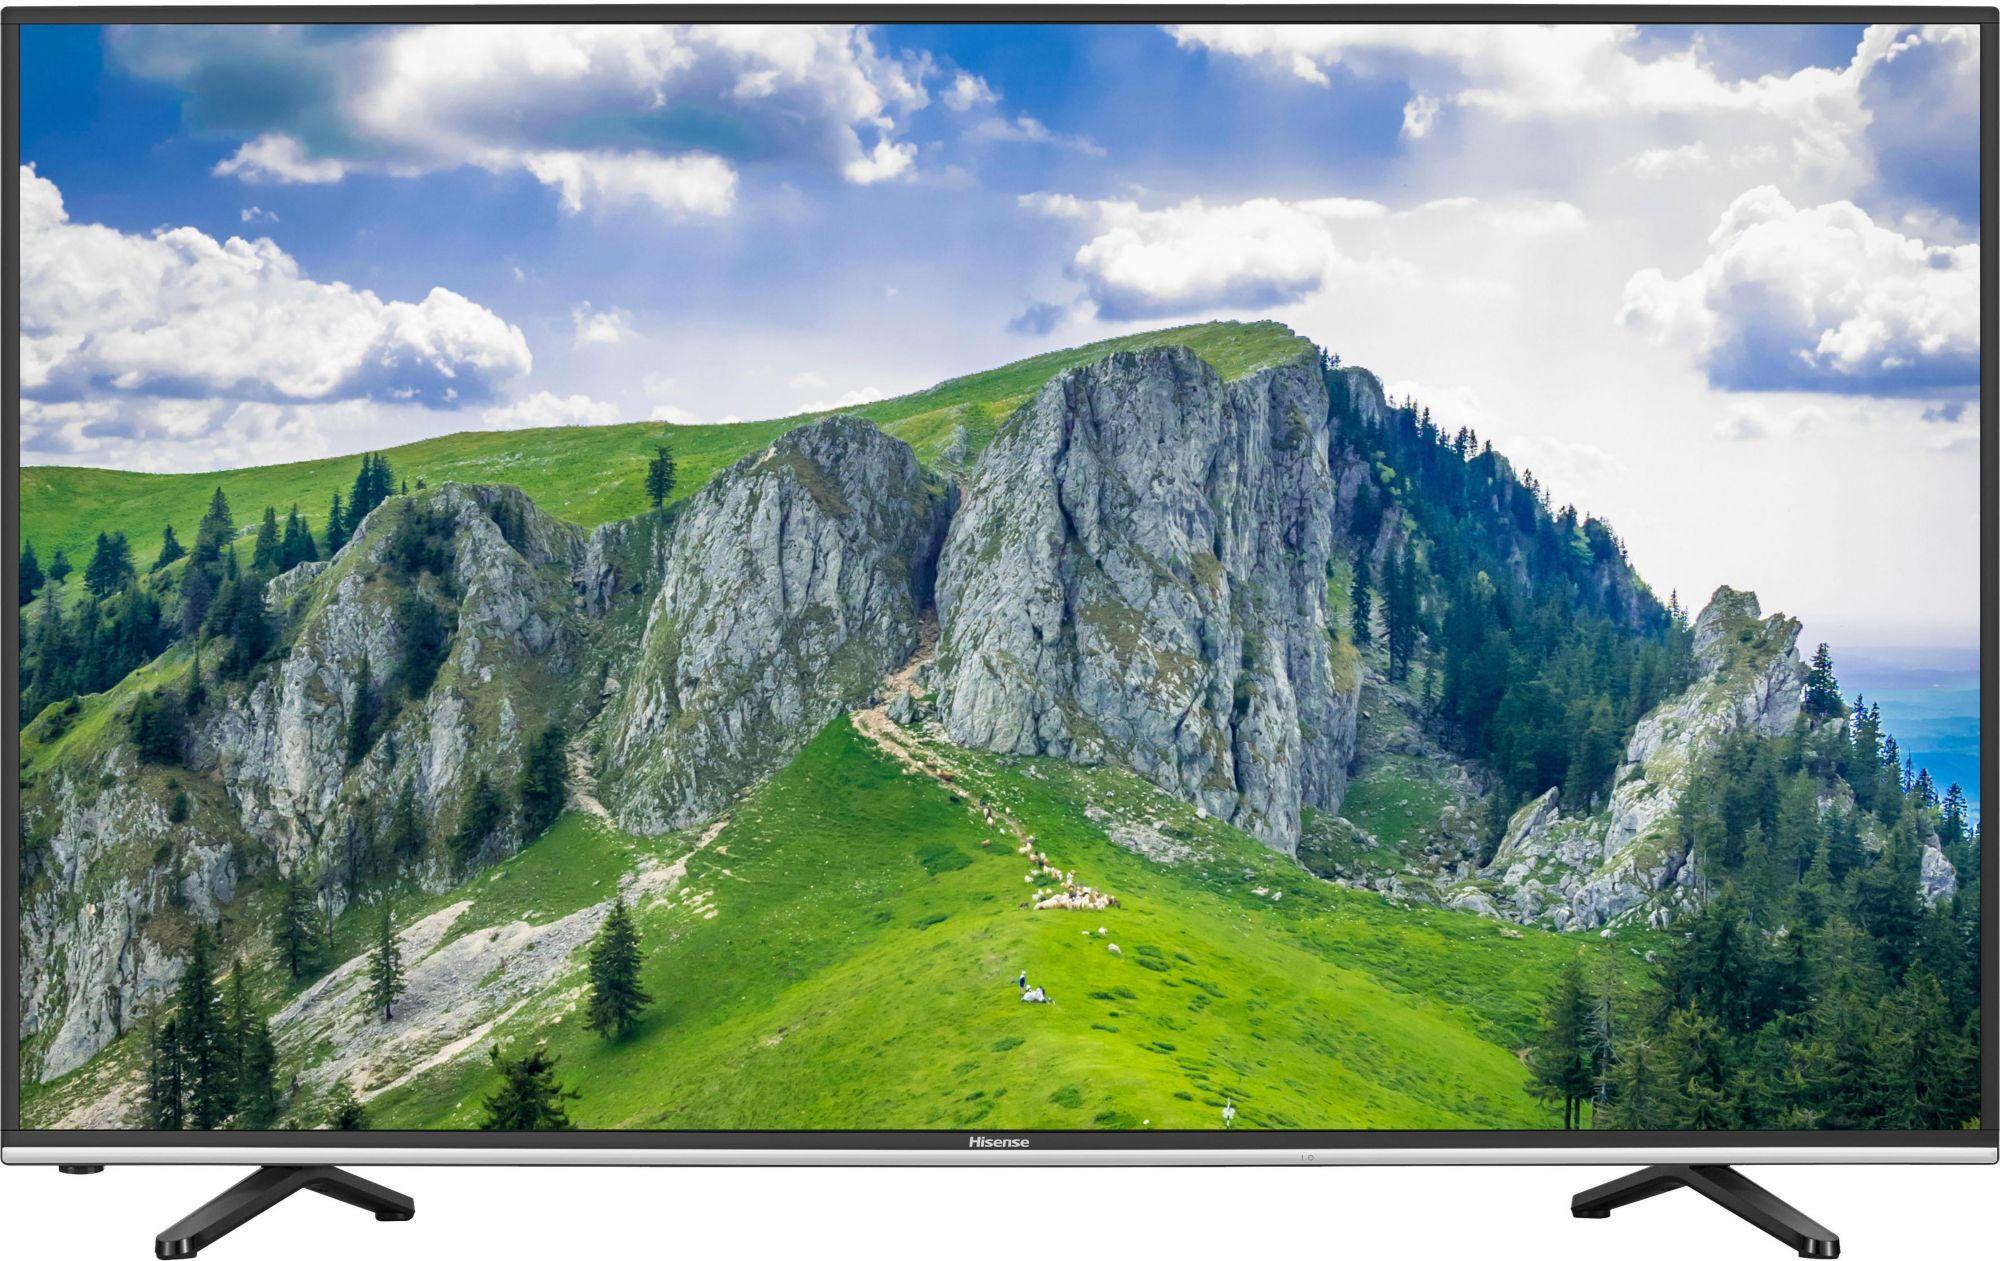 HISENSE Hisense H55MEC3050, LED Fernseher, 138 cm (55 Zoll), 2160p (4K Ultra HD), Smart-TV